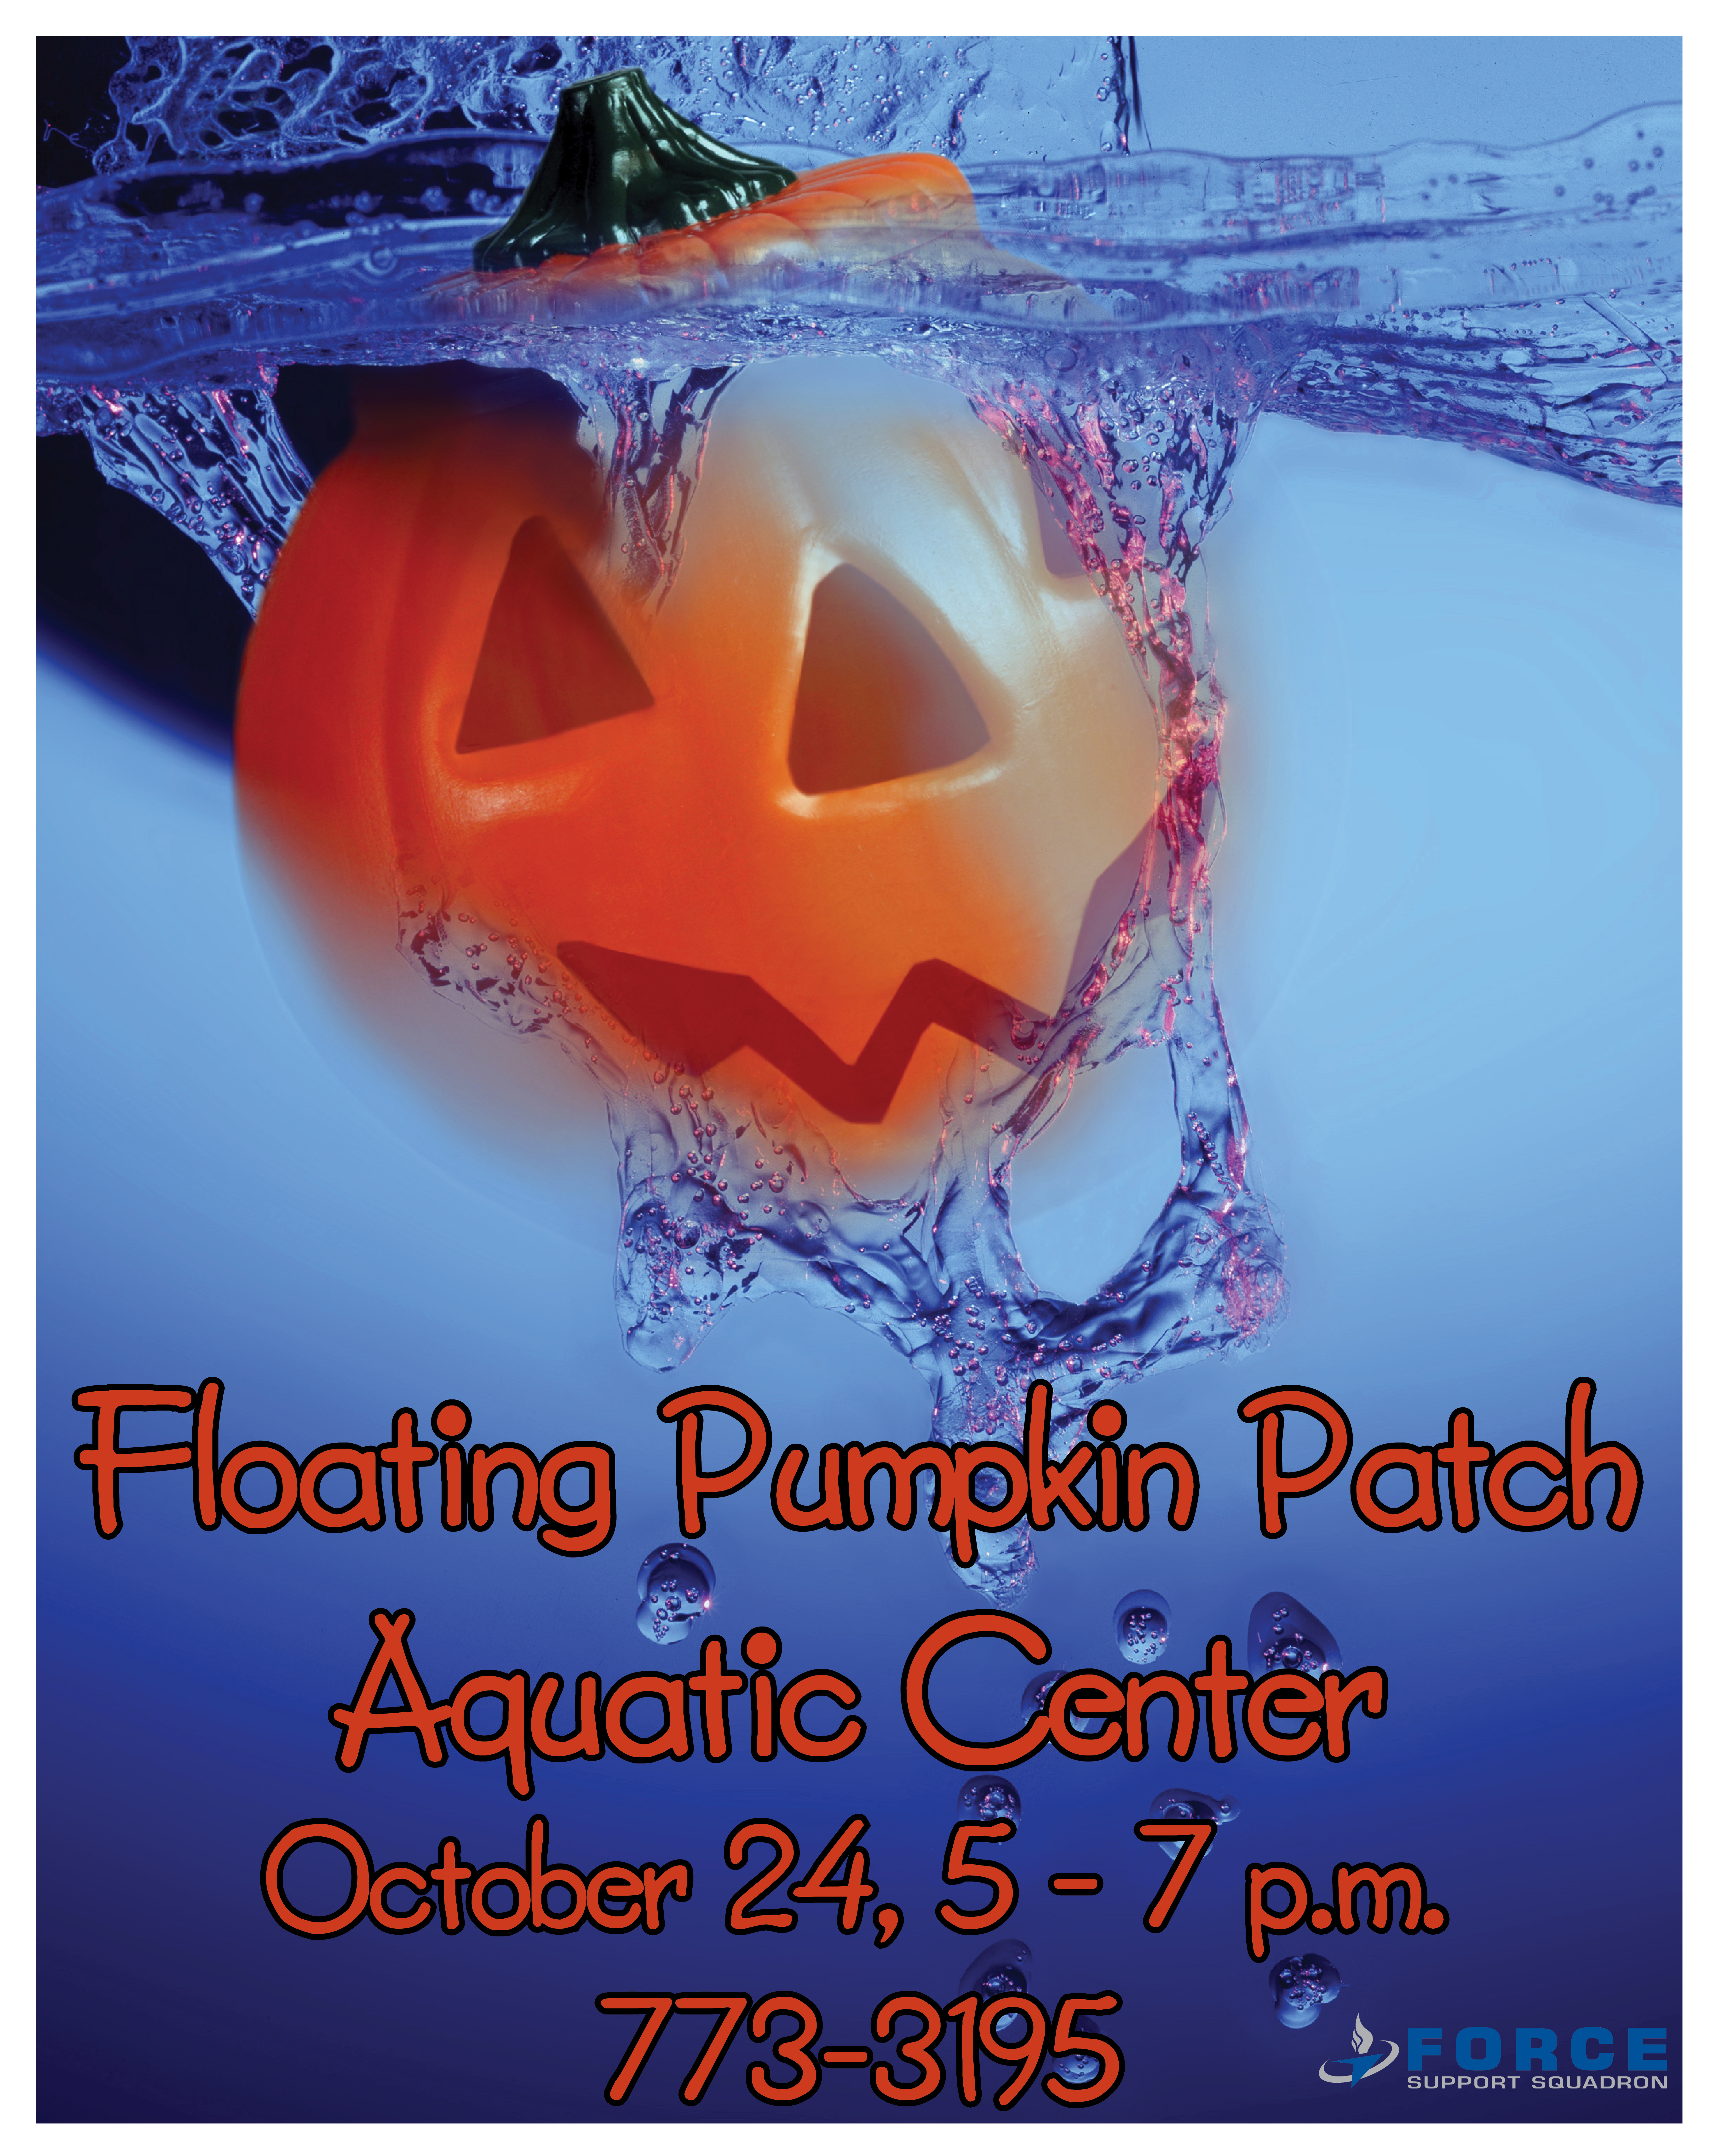 , Floating Pumpkin Patch